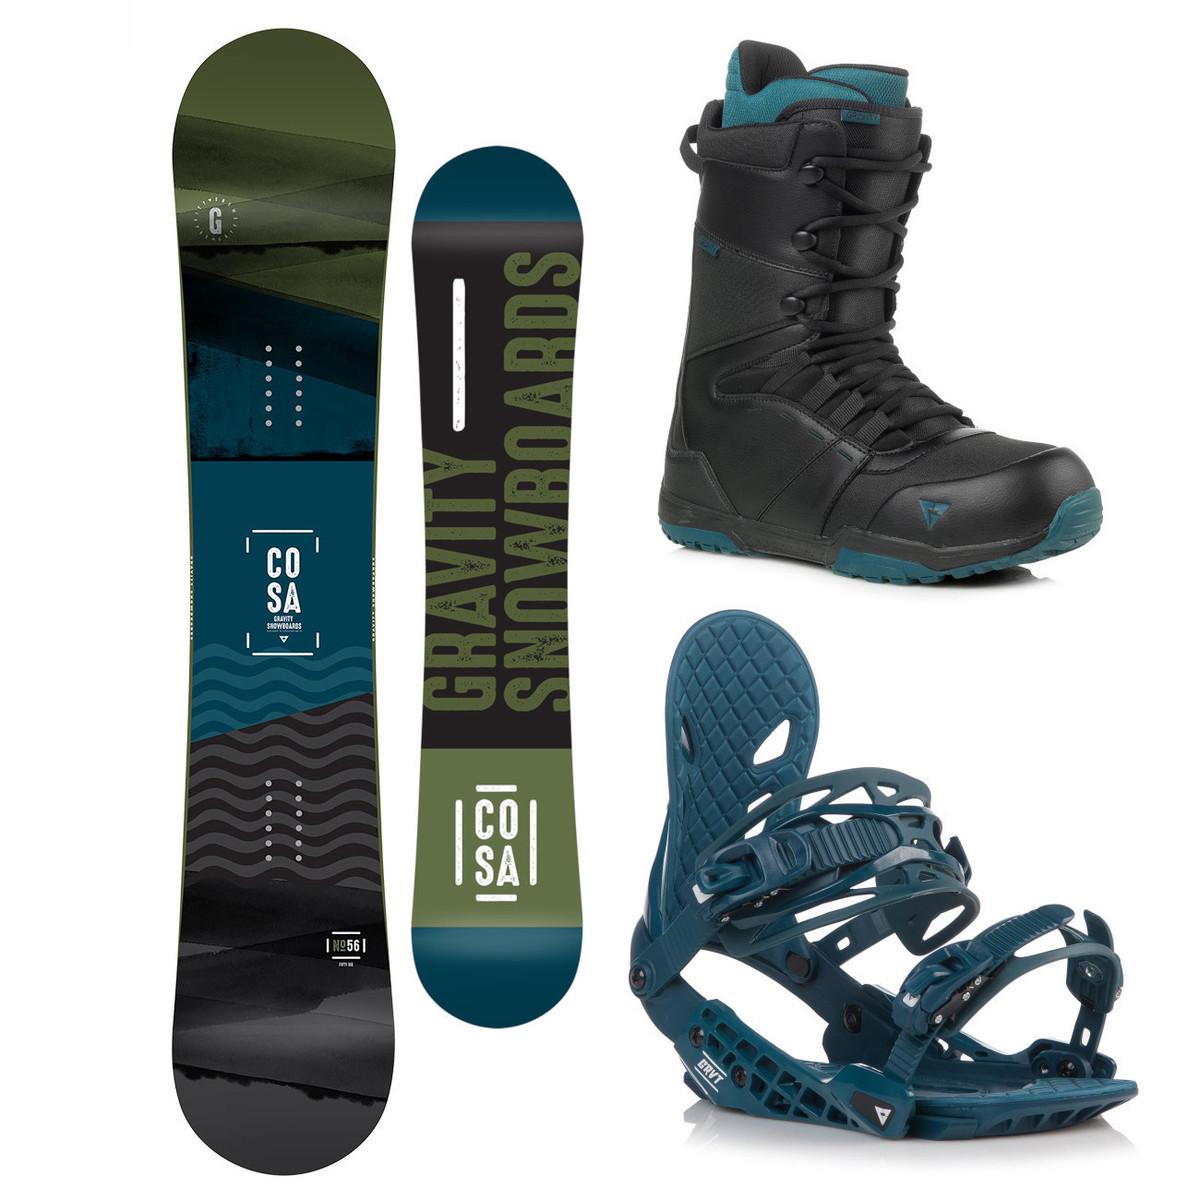 Snowboardový komplet Gravity Cosa 18/19 L (EU 42-48) 163W